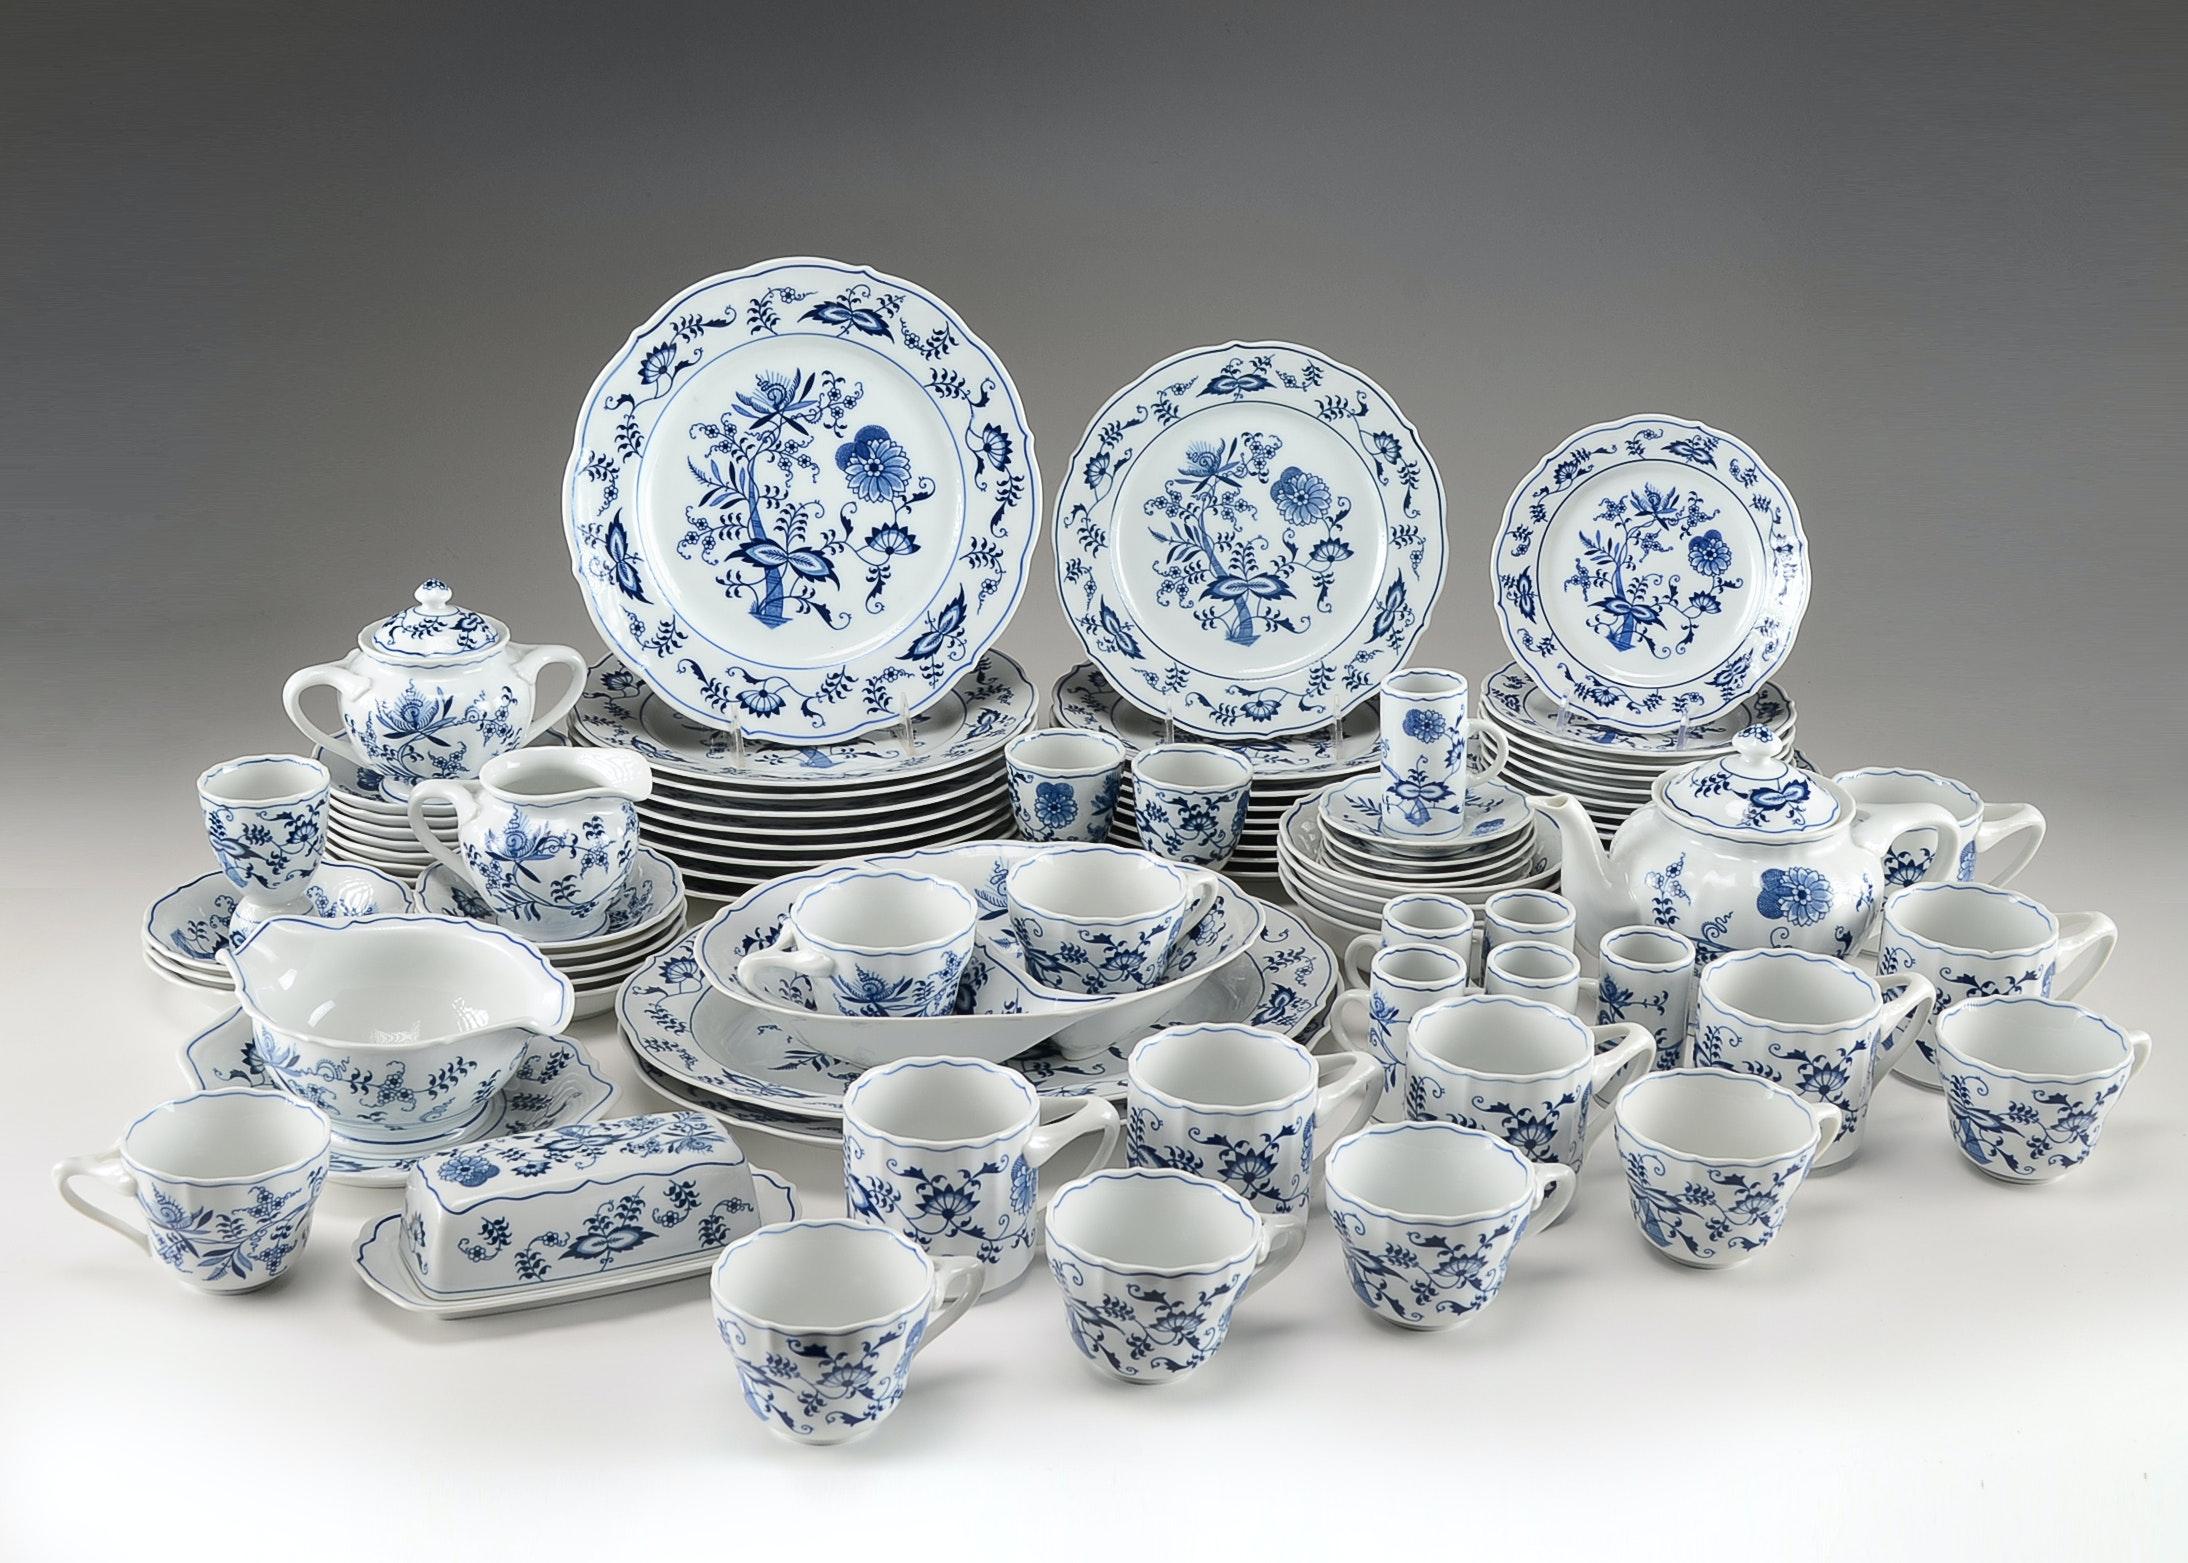 Blue Danube Blue Onion China Set ... & Blue Danube Blue Onion China Set : EBTH